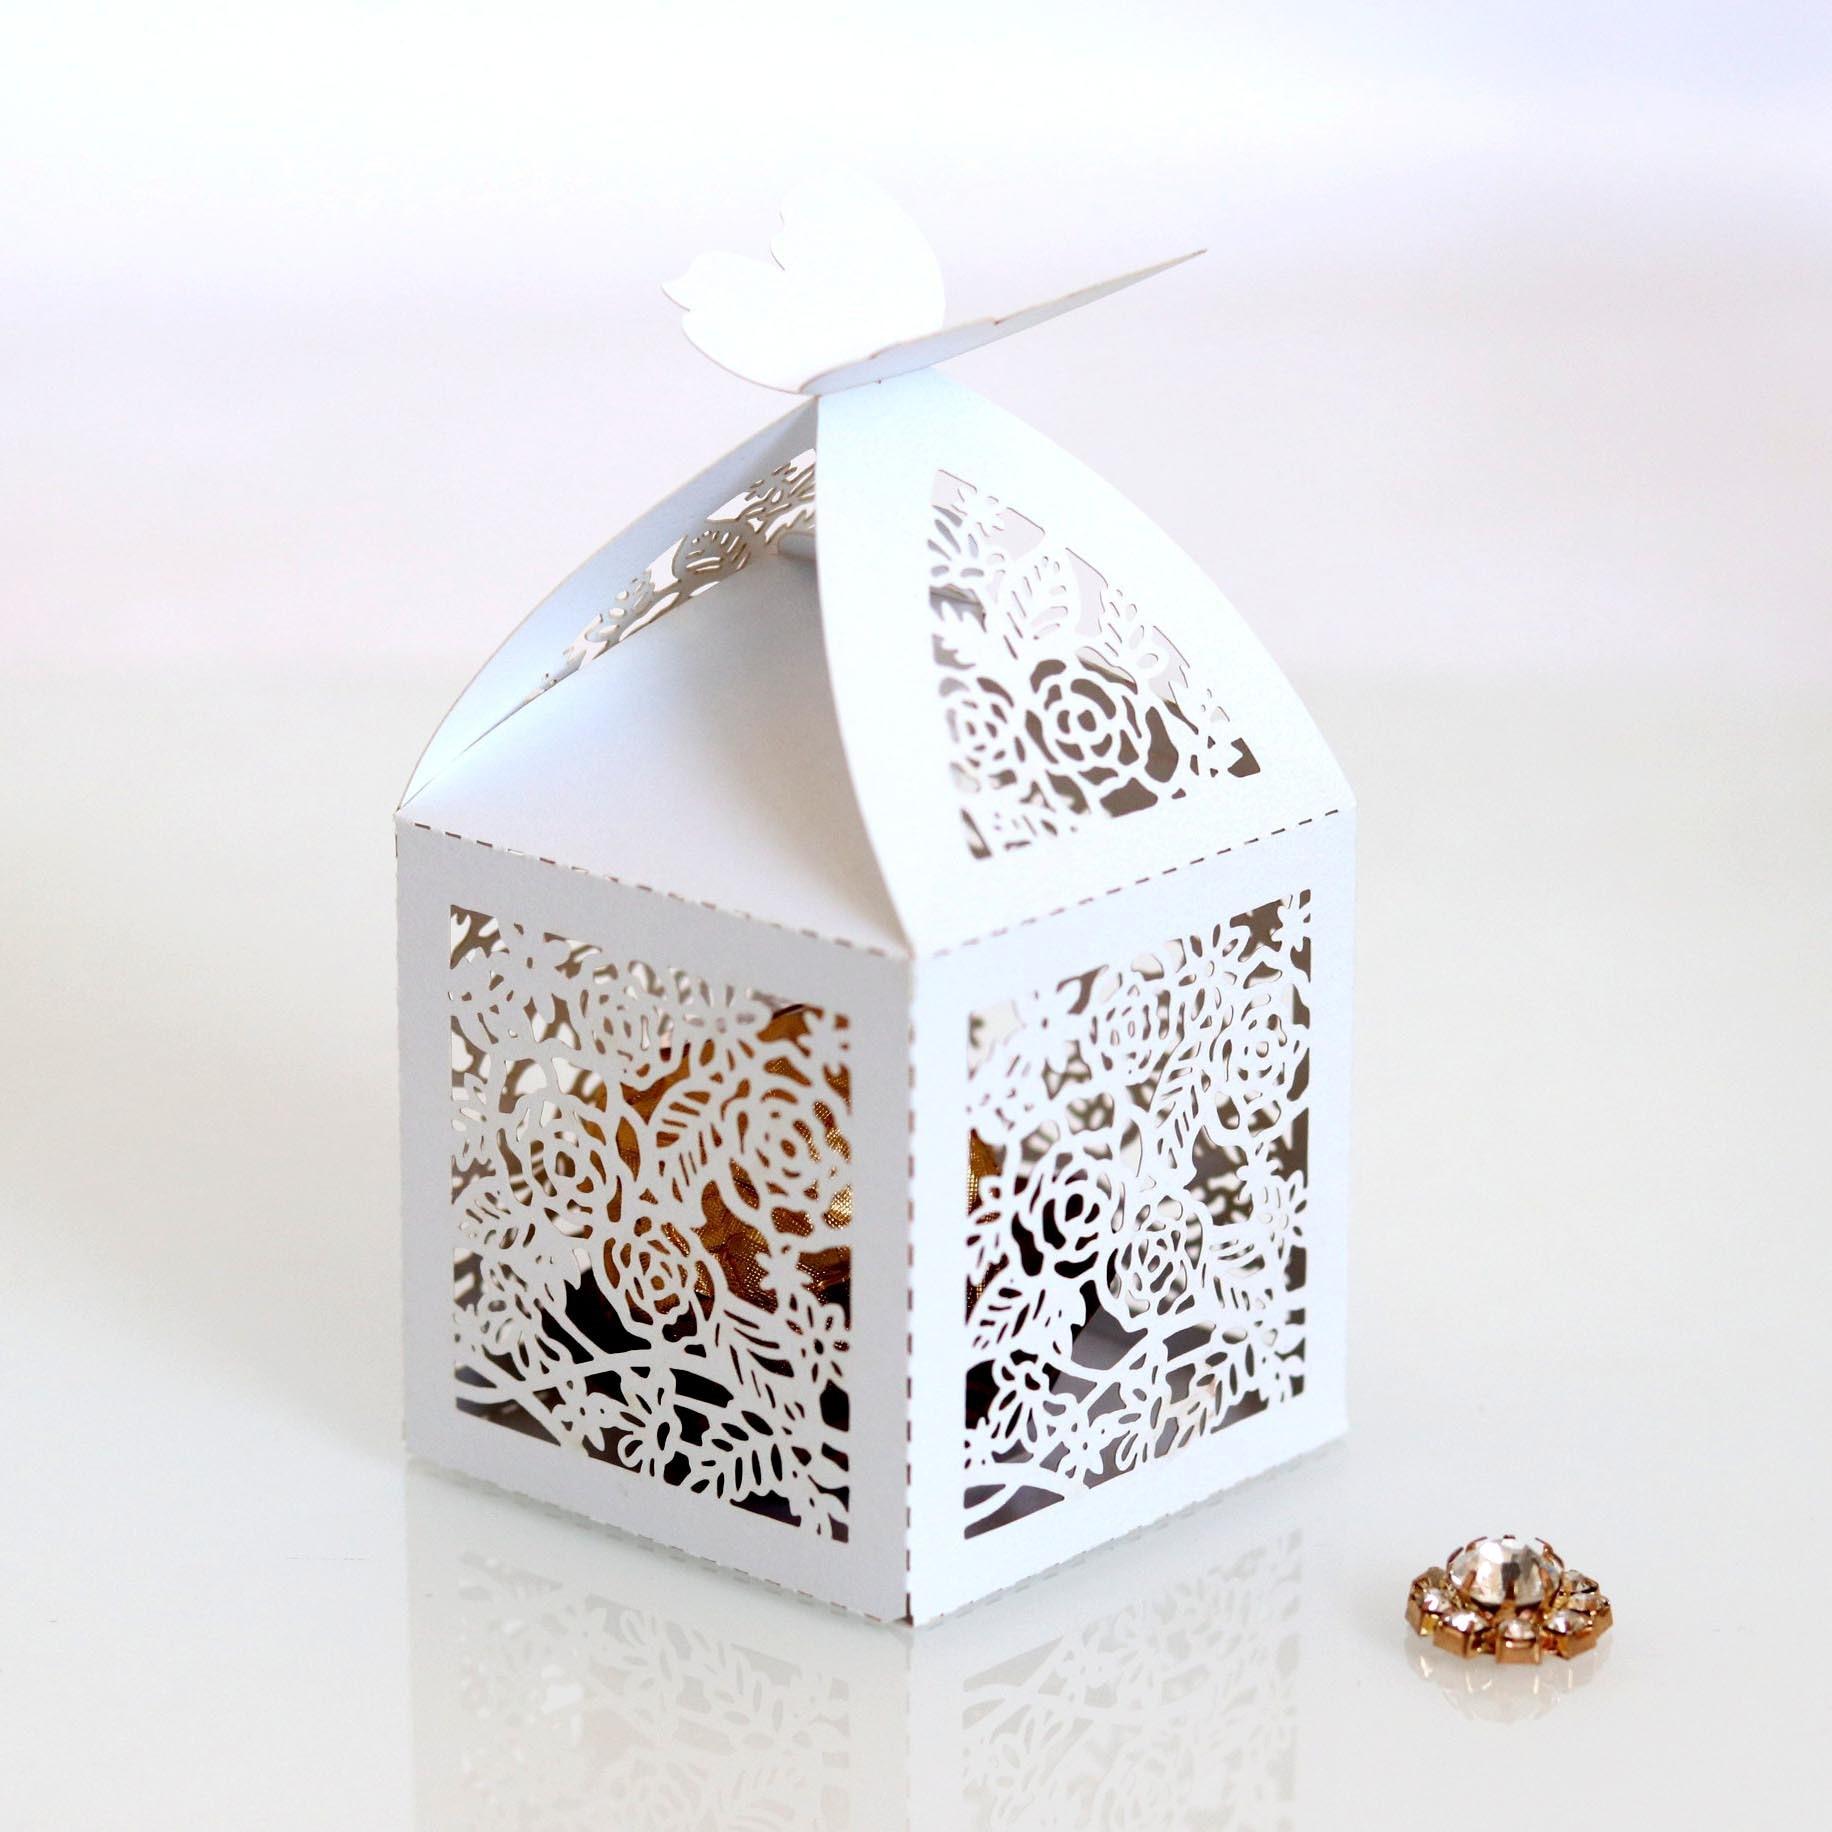 Hollow Die-Cut Butterfly Bukle Favor Boxes Wedding Candy Boxes Wedding Gift Boxes Hollow Rose Chocolate Box